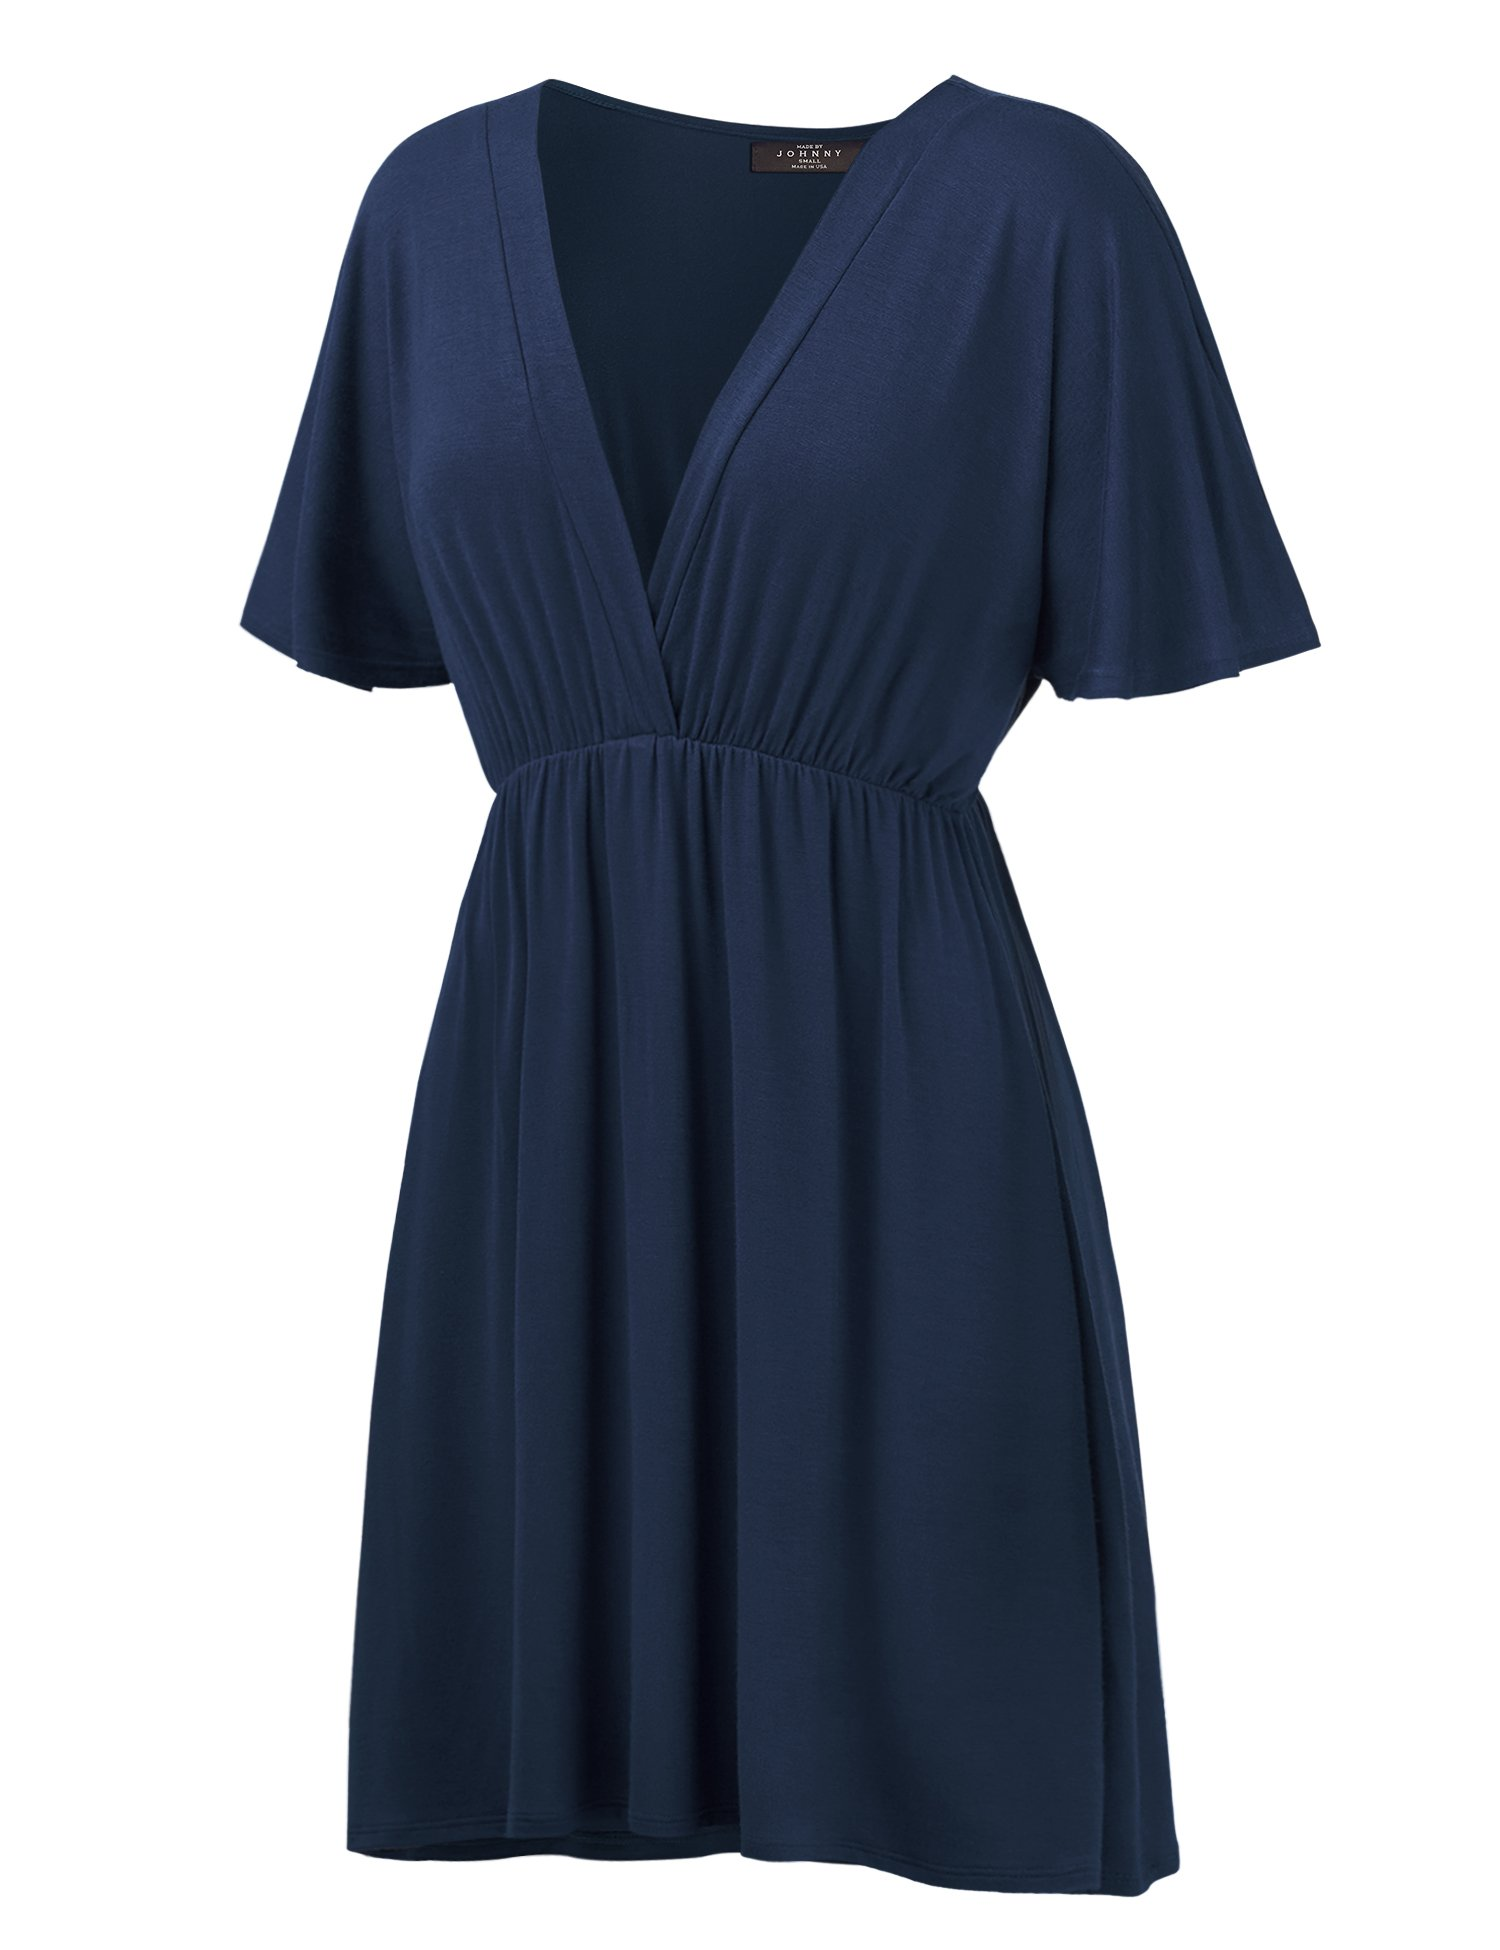 WDR1338 Womens Short Sleeve Kimono Style Dress Top M NAVY